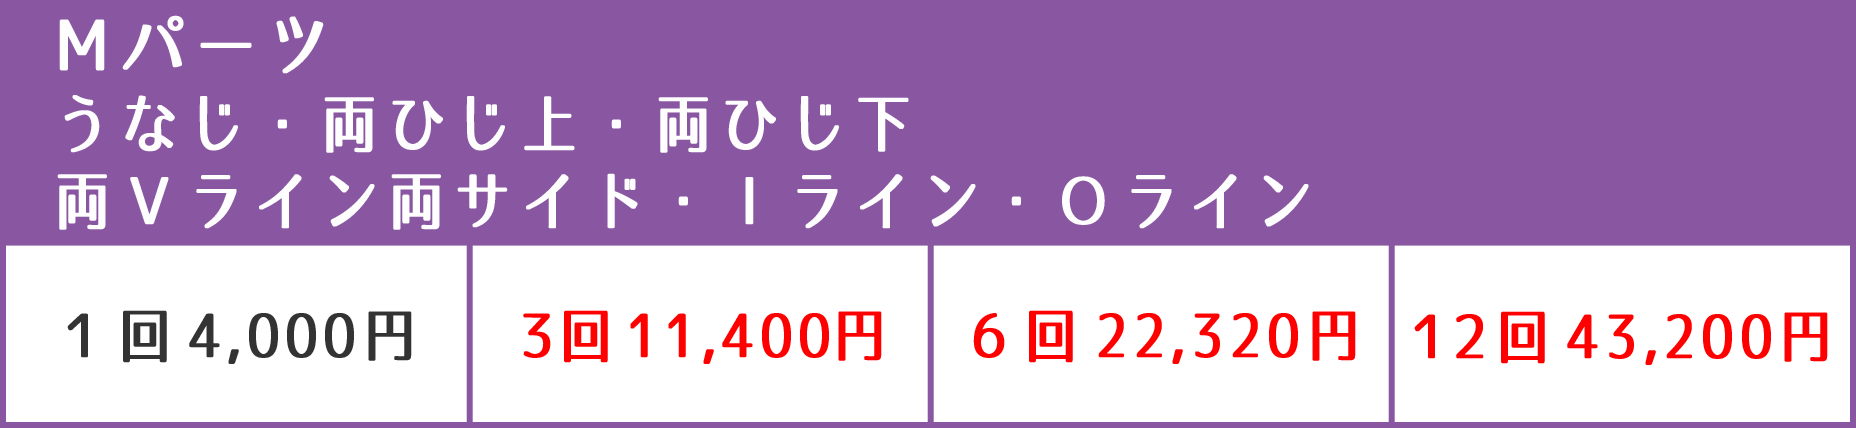 Mパーツ料金表